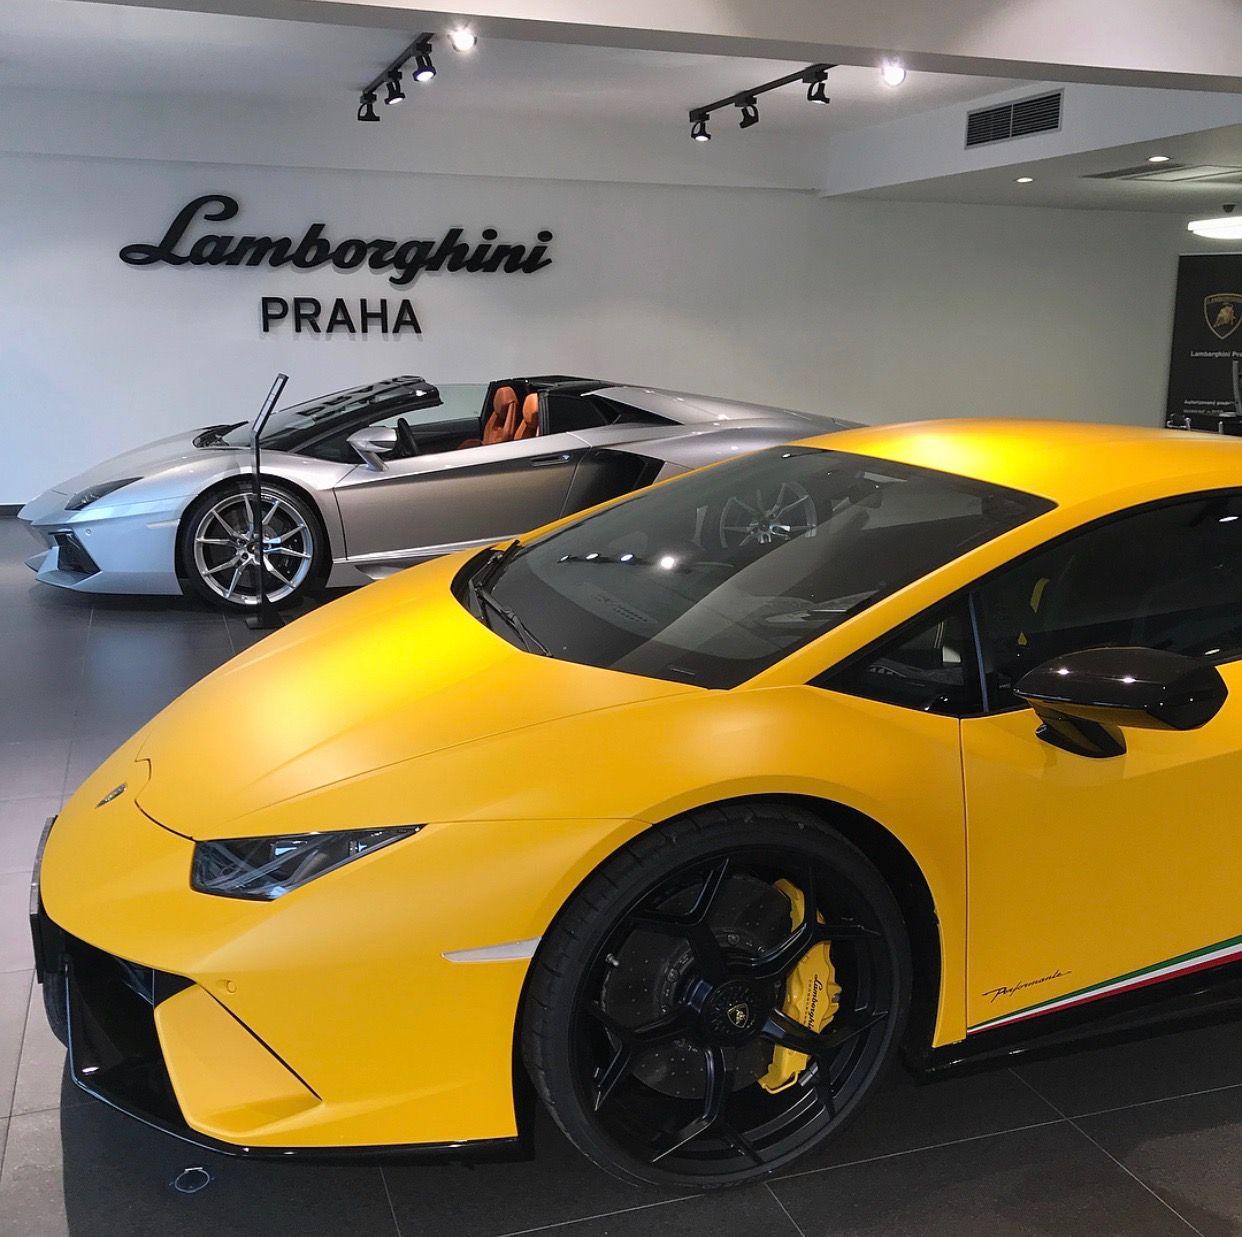 Lamborghini Huracan Performante painted in Giallo Horus w/ Tricolore ...